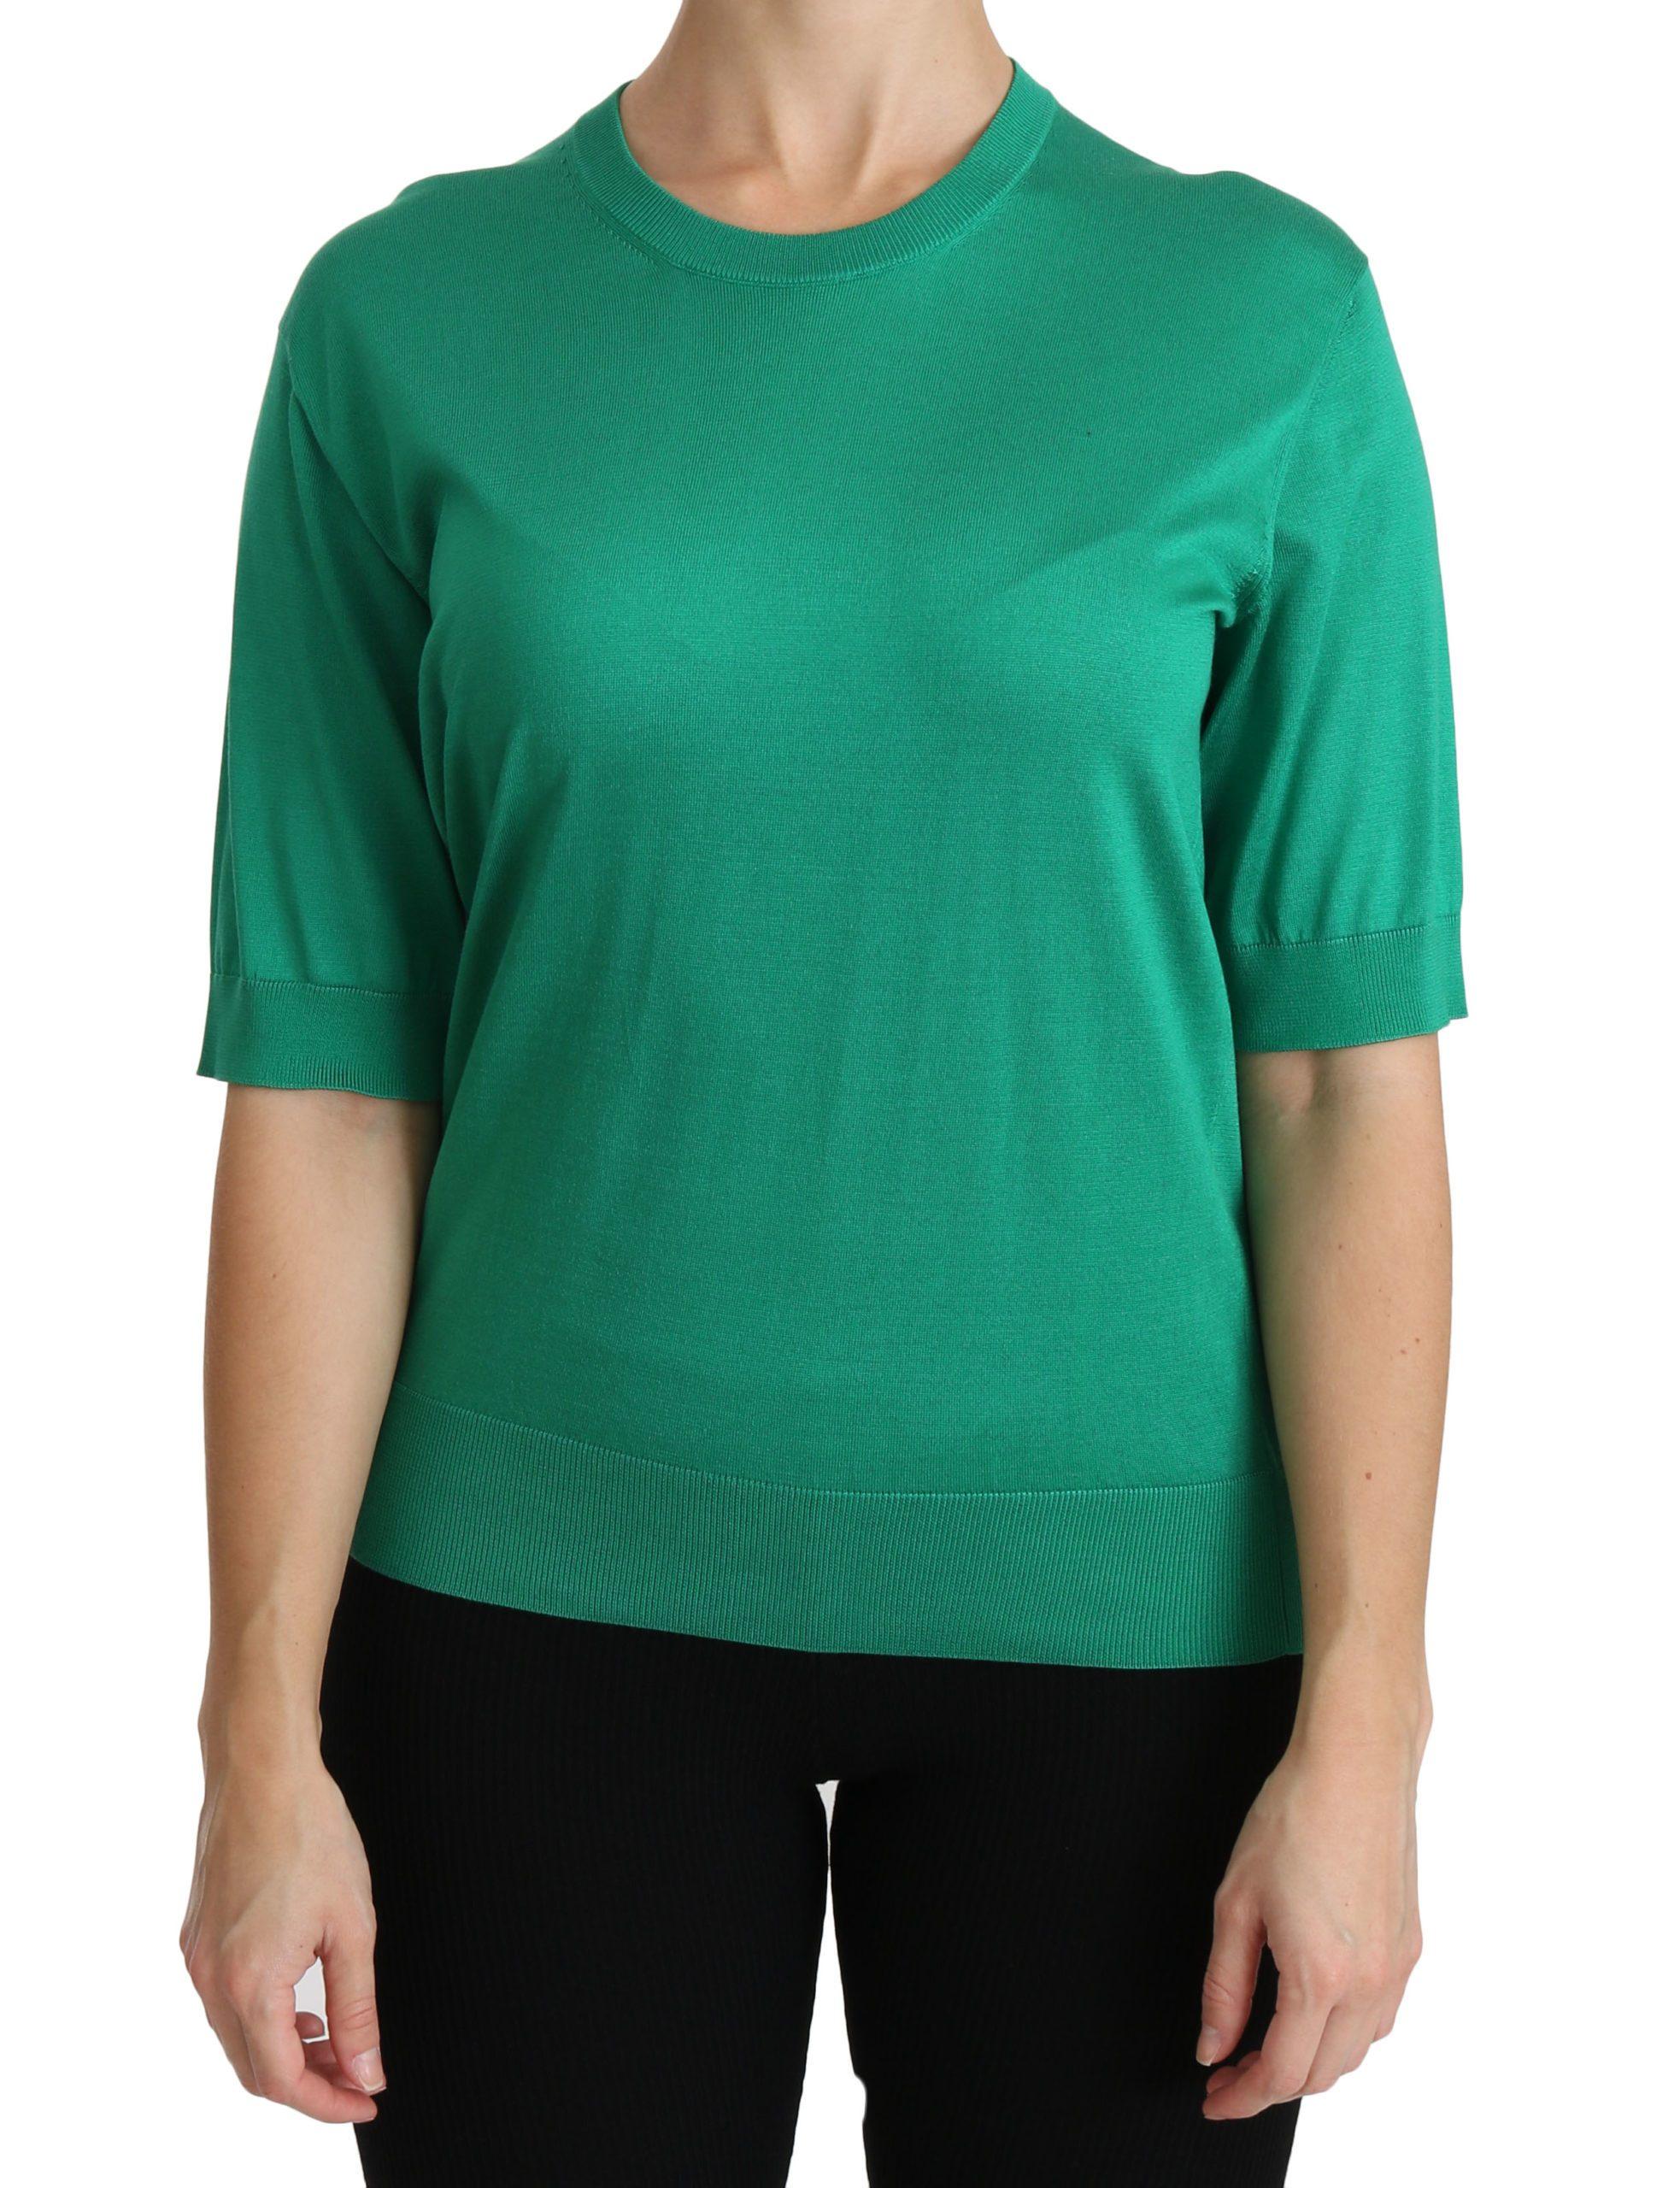 Dolce & Gabbana Women's Crewneck Short Sleeve Top Green TSH4249 - IT40|S